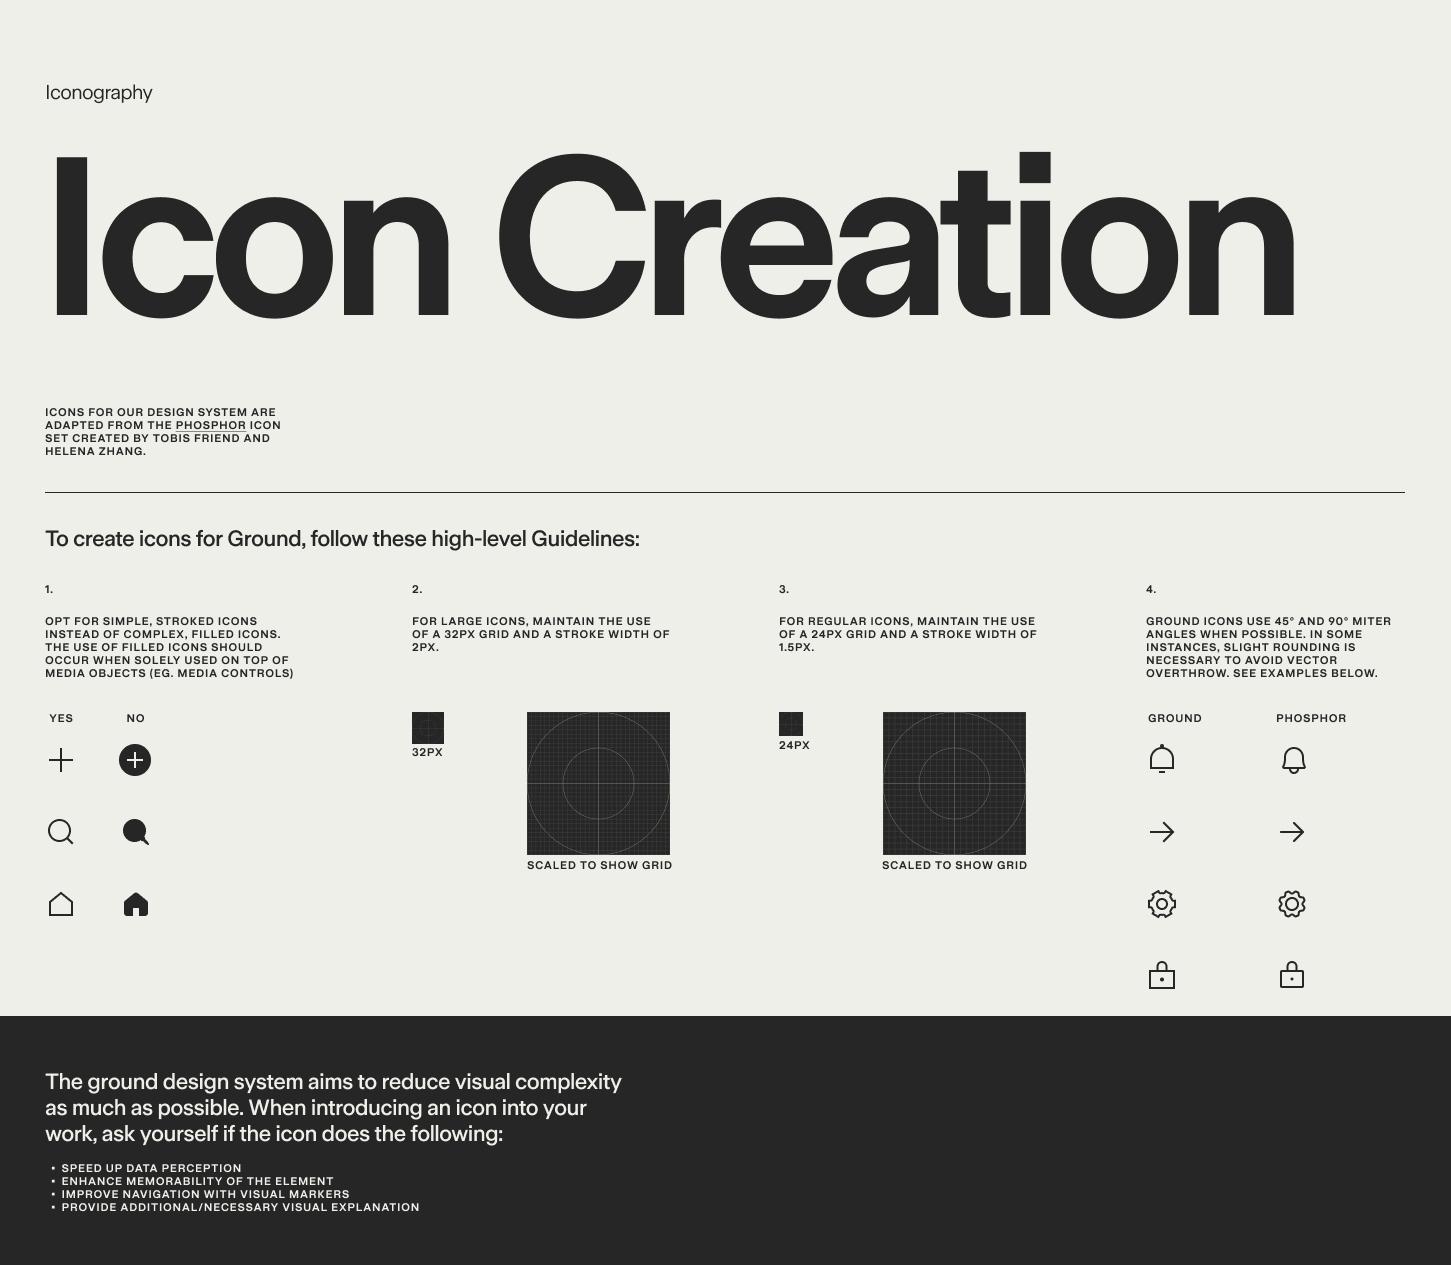 Icon-Creation-Guidance